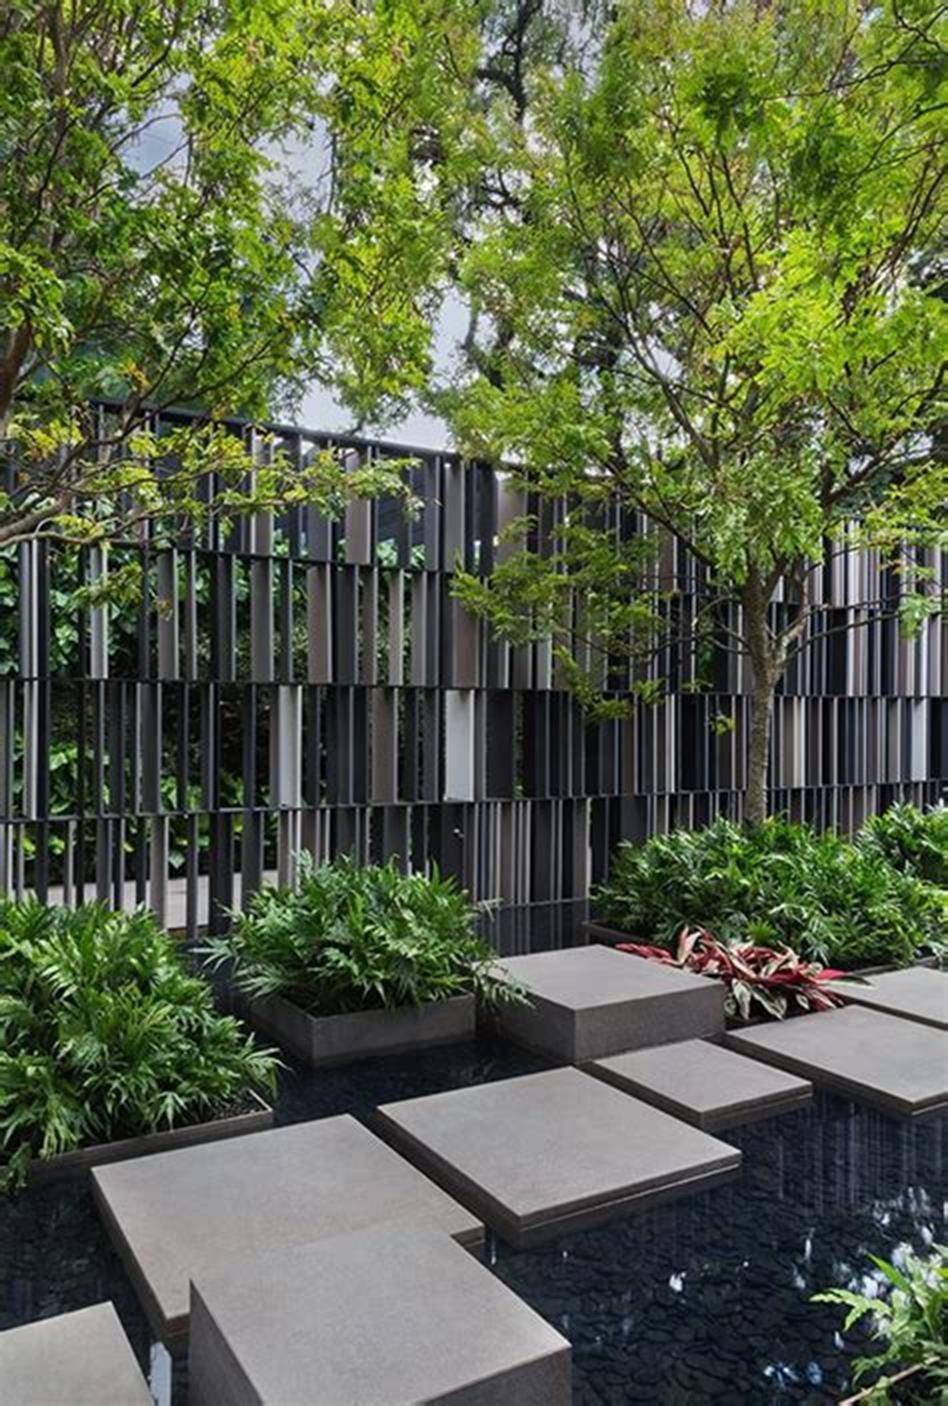 32 Amazing Contemporary Backyard Ideas To Inspire You Craft Home Ideas Kolam Ikan Lanskap Kebun Contemporary backyard landscaping ideas